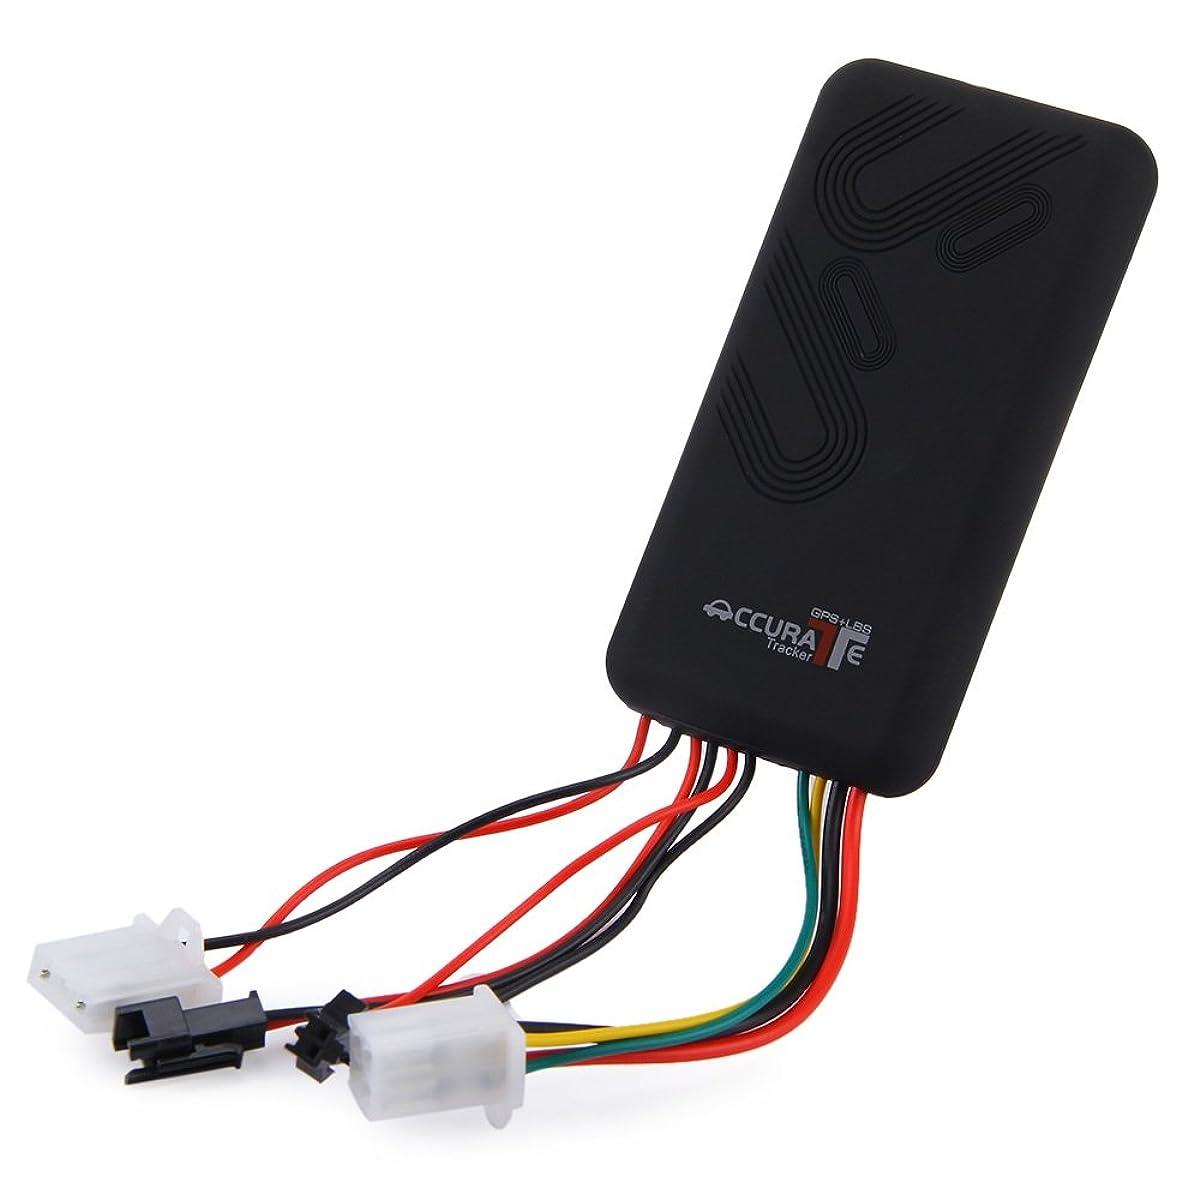 GPS SMS GPRS GSM Vehicle Tracker Locator Remote Control Tracking Alarm